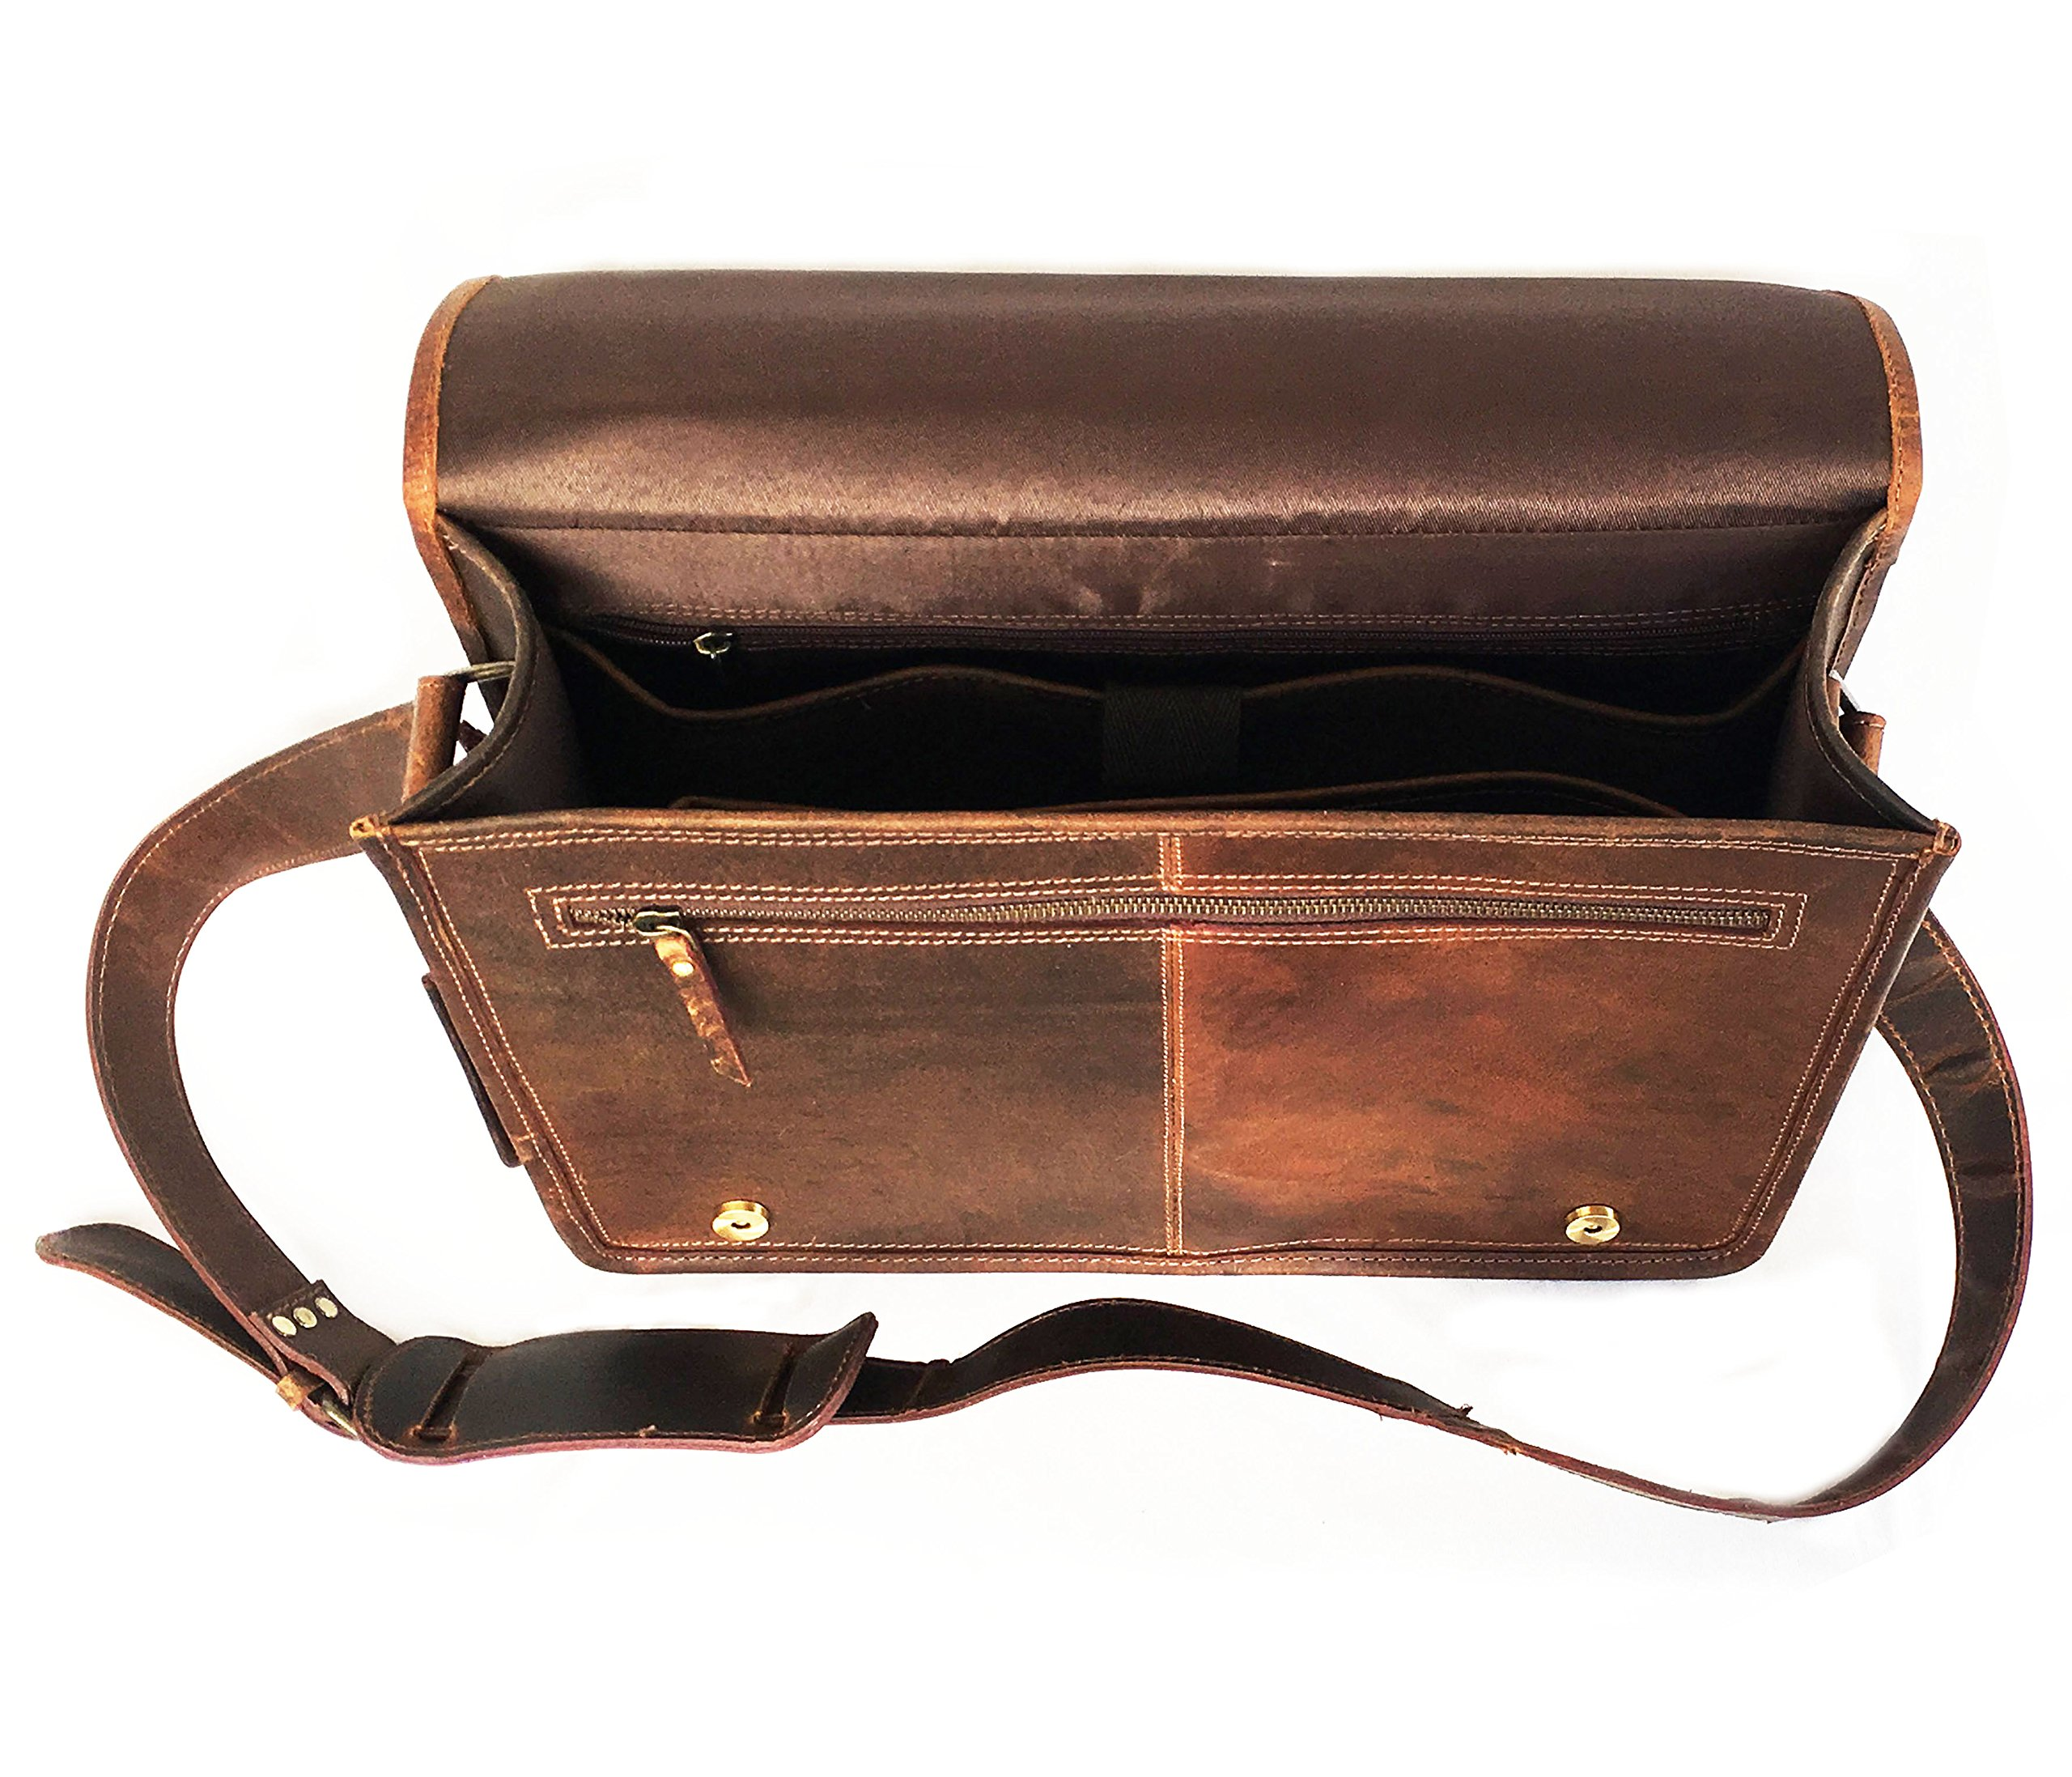 16 Inch Leather Vintage Rustic Crossbody Messenger Courier Satchel Bag Gift Men Women ~ Business Work Briefcase Carry Laptop Computer Book Handmade Rugged & Distressed By KK's Leather by kk's leather (Image #5)